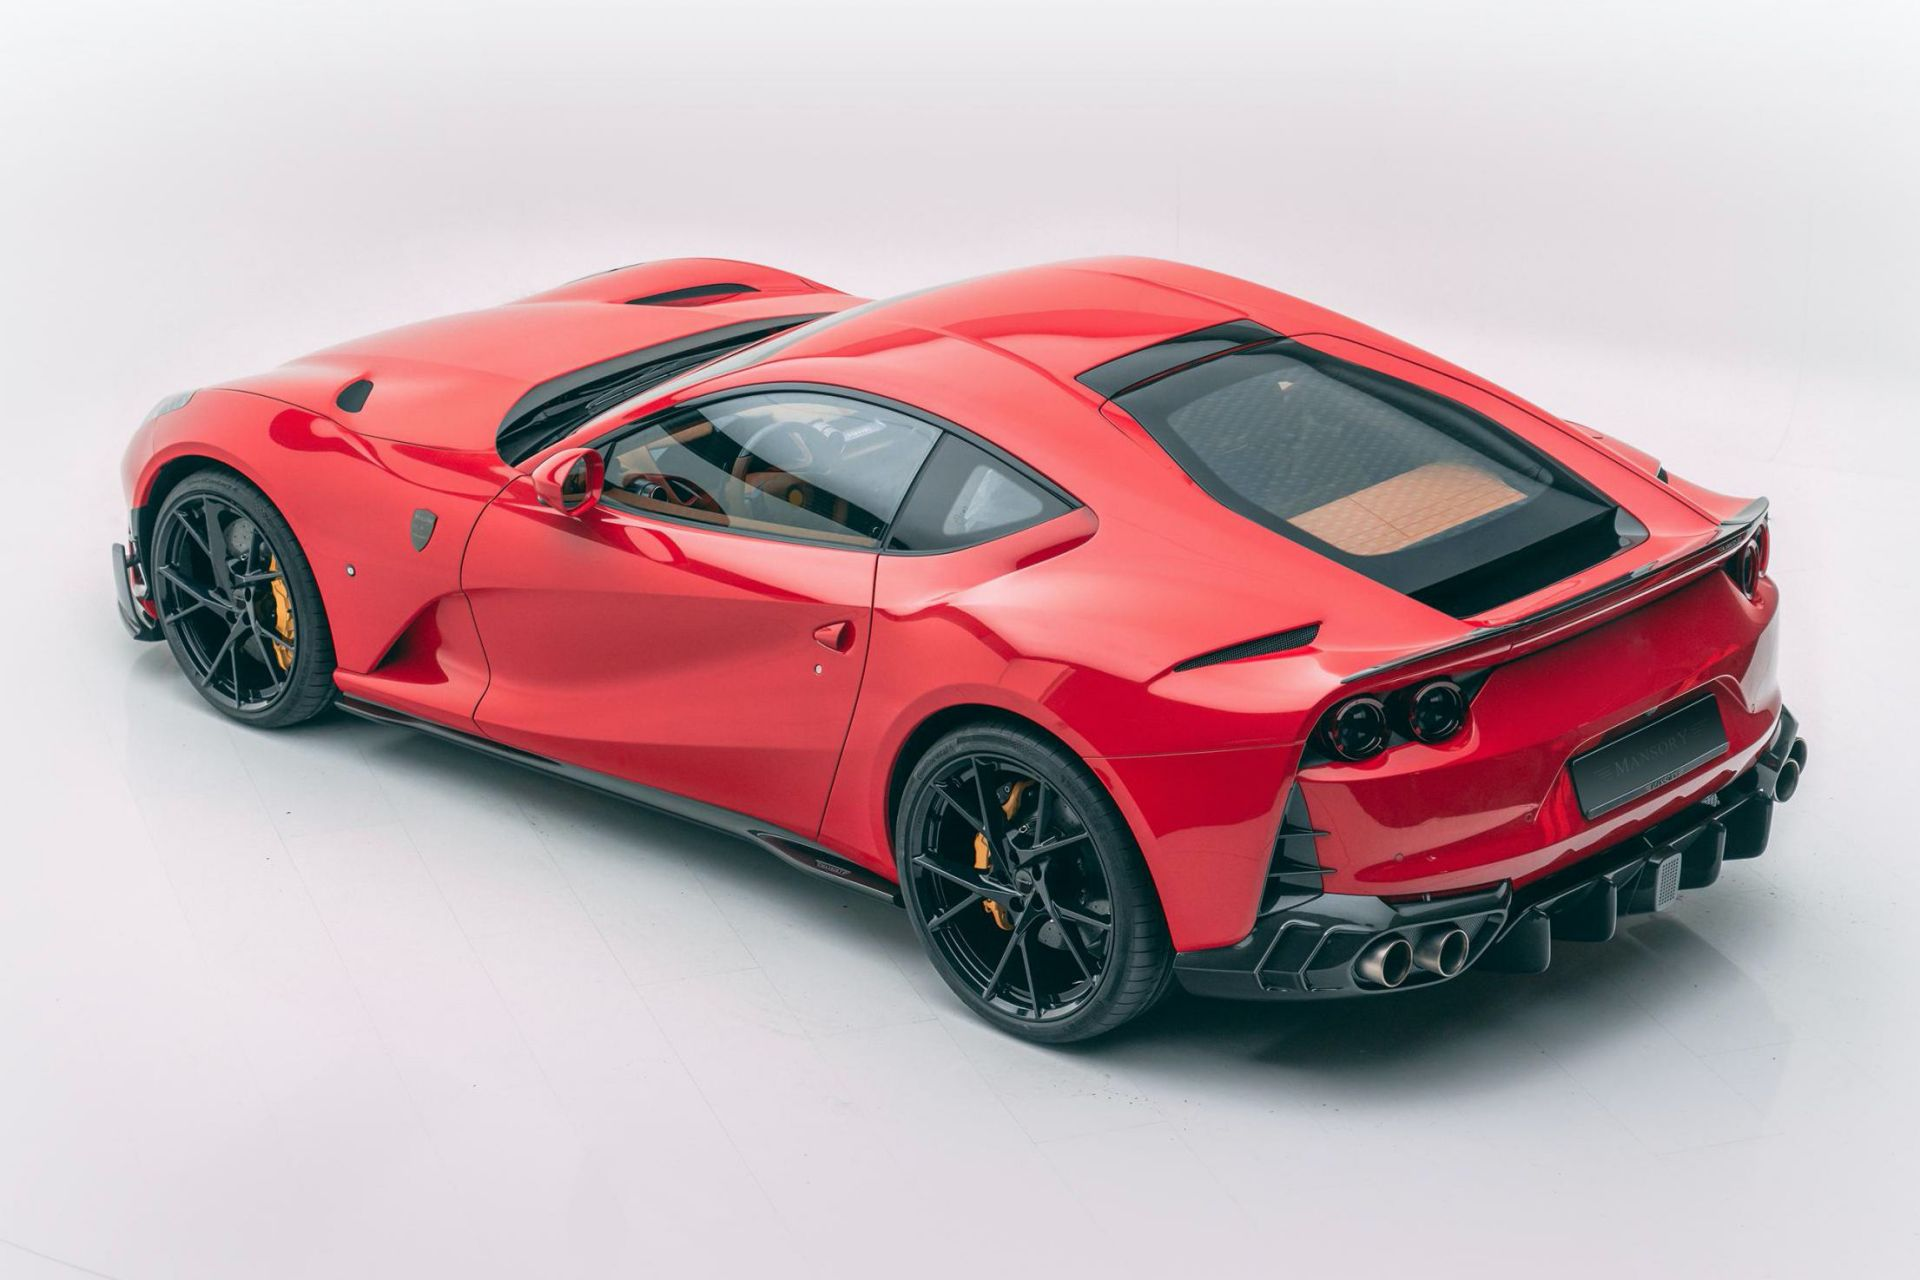 Ferrari-812-Superfast-by-Mansory-2